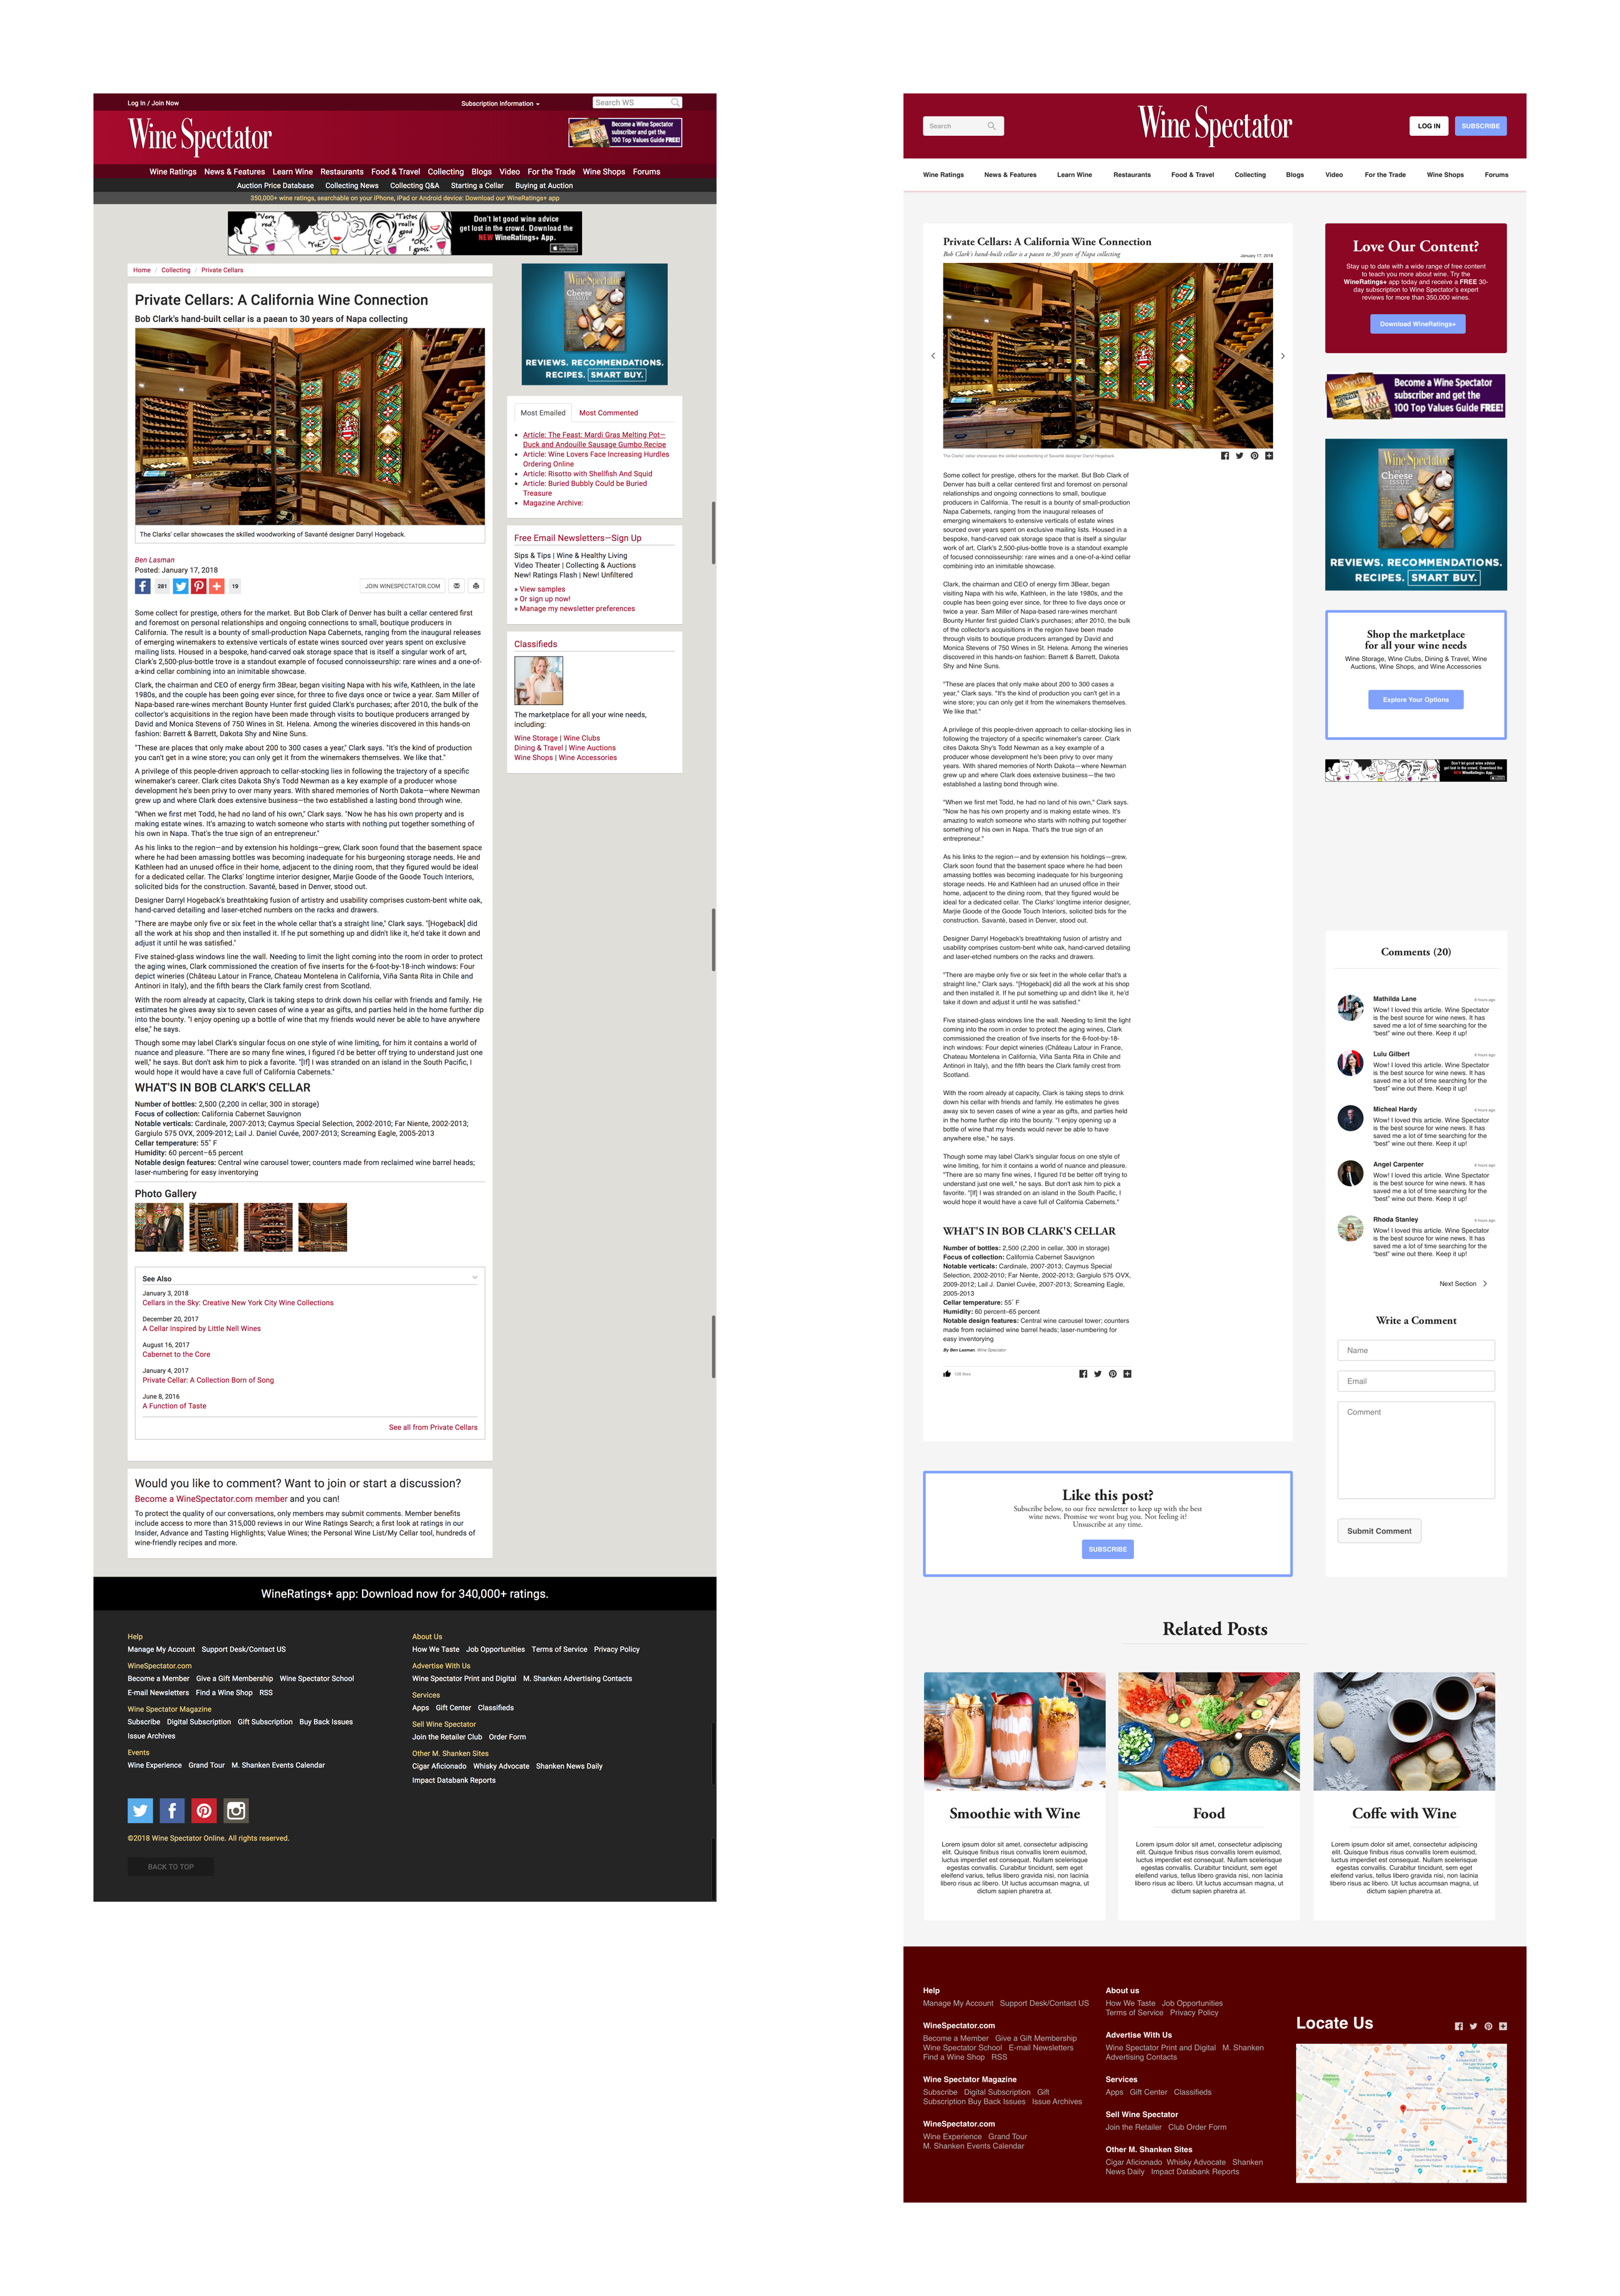 Wine Spectator Blog Post Redesign on Behance